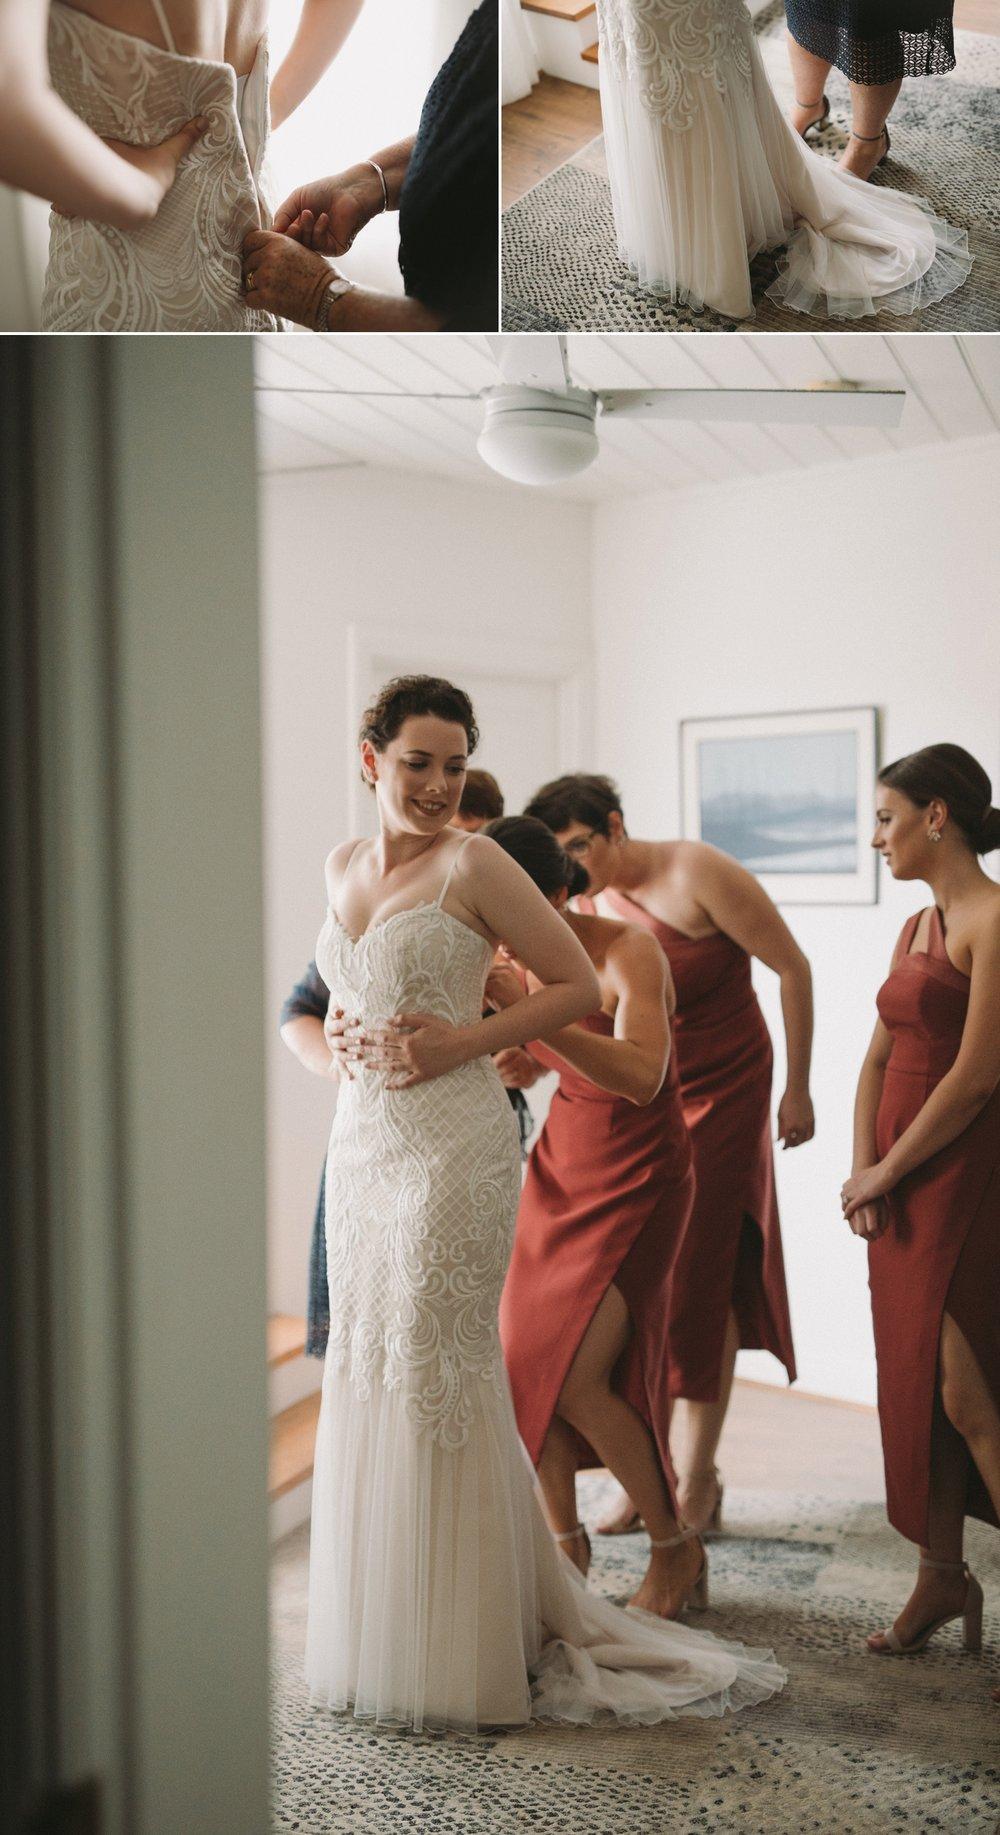 Emma & Aaron - Marybank Estate Wedding - Natural Wedding Photography in Adelaide - www.katherineschultzphotography.com_0023.jpg